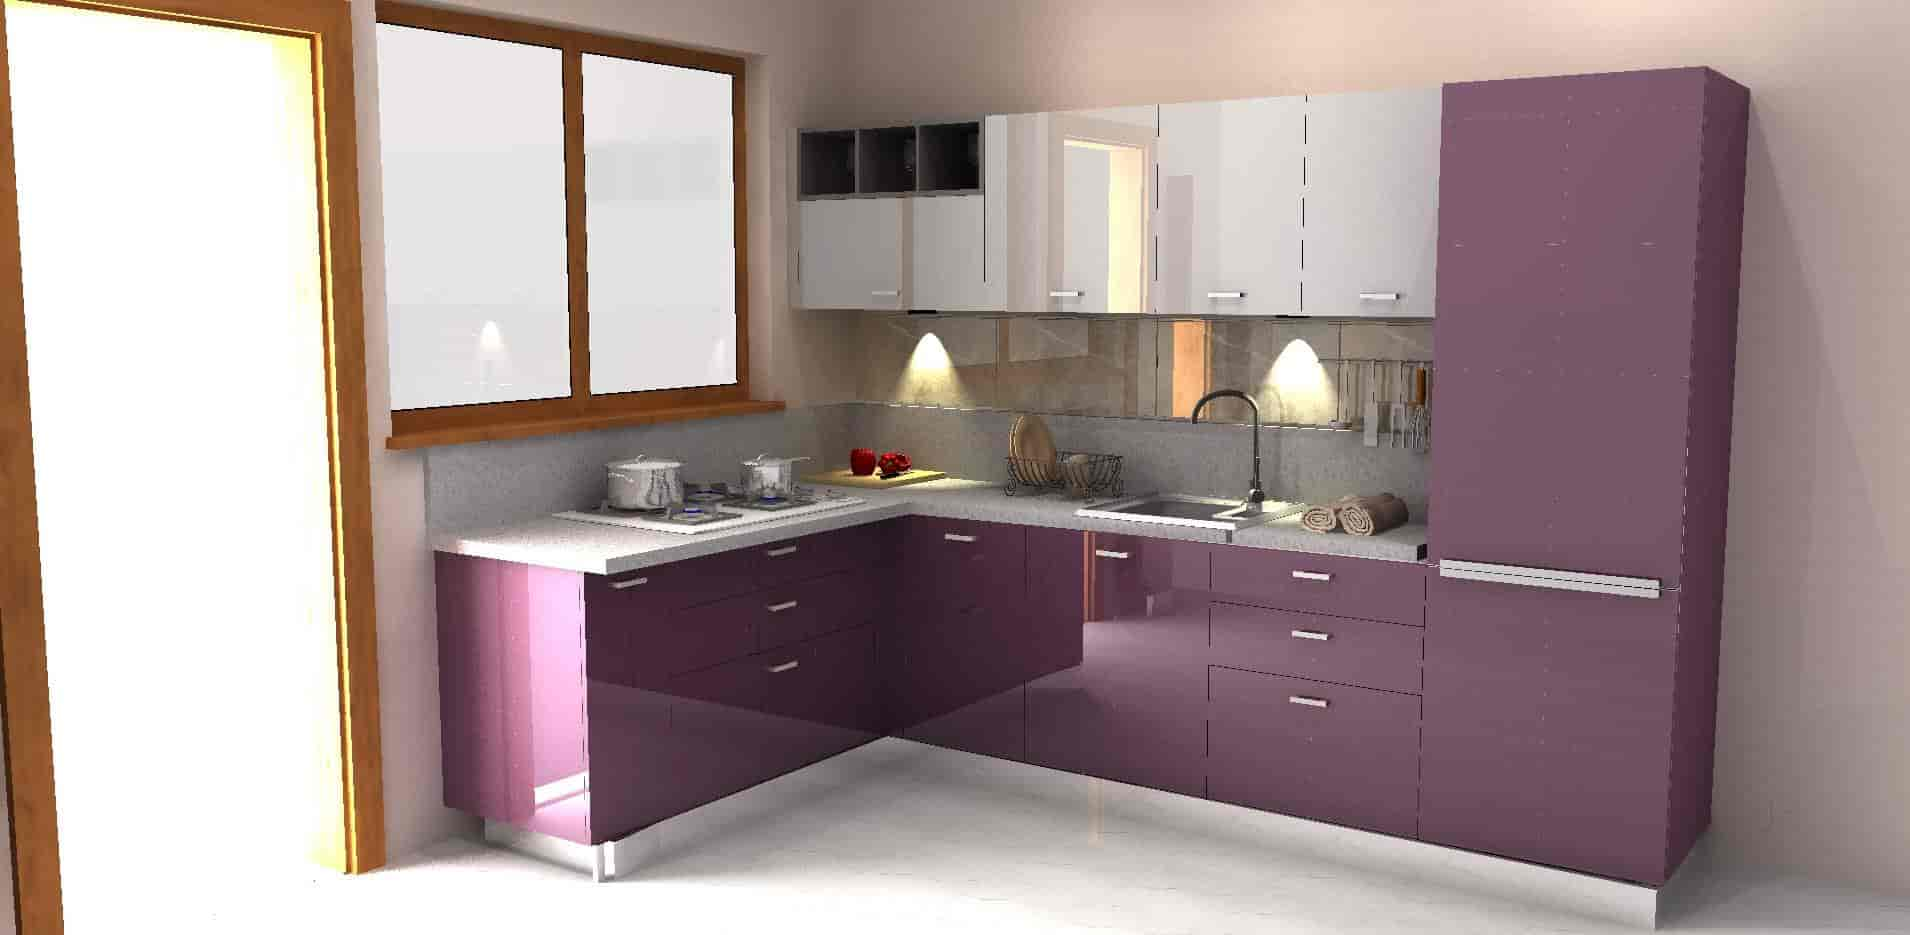 Sleek Kitchens, Godhra   HD Retails   Modular Kitchen Dealers Sleek In  Panchmahal   Justdial